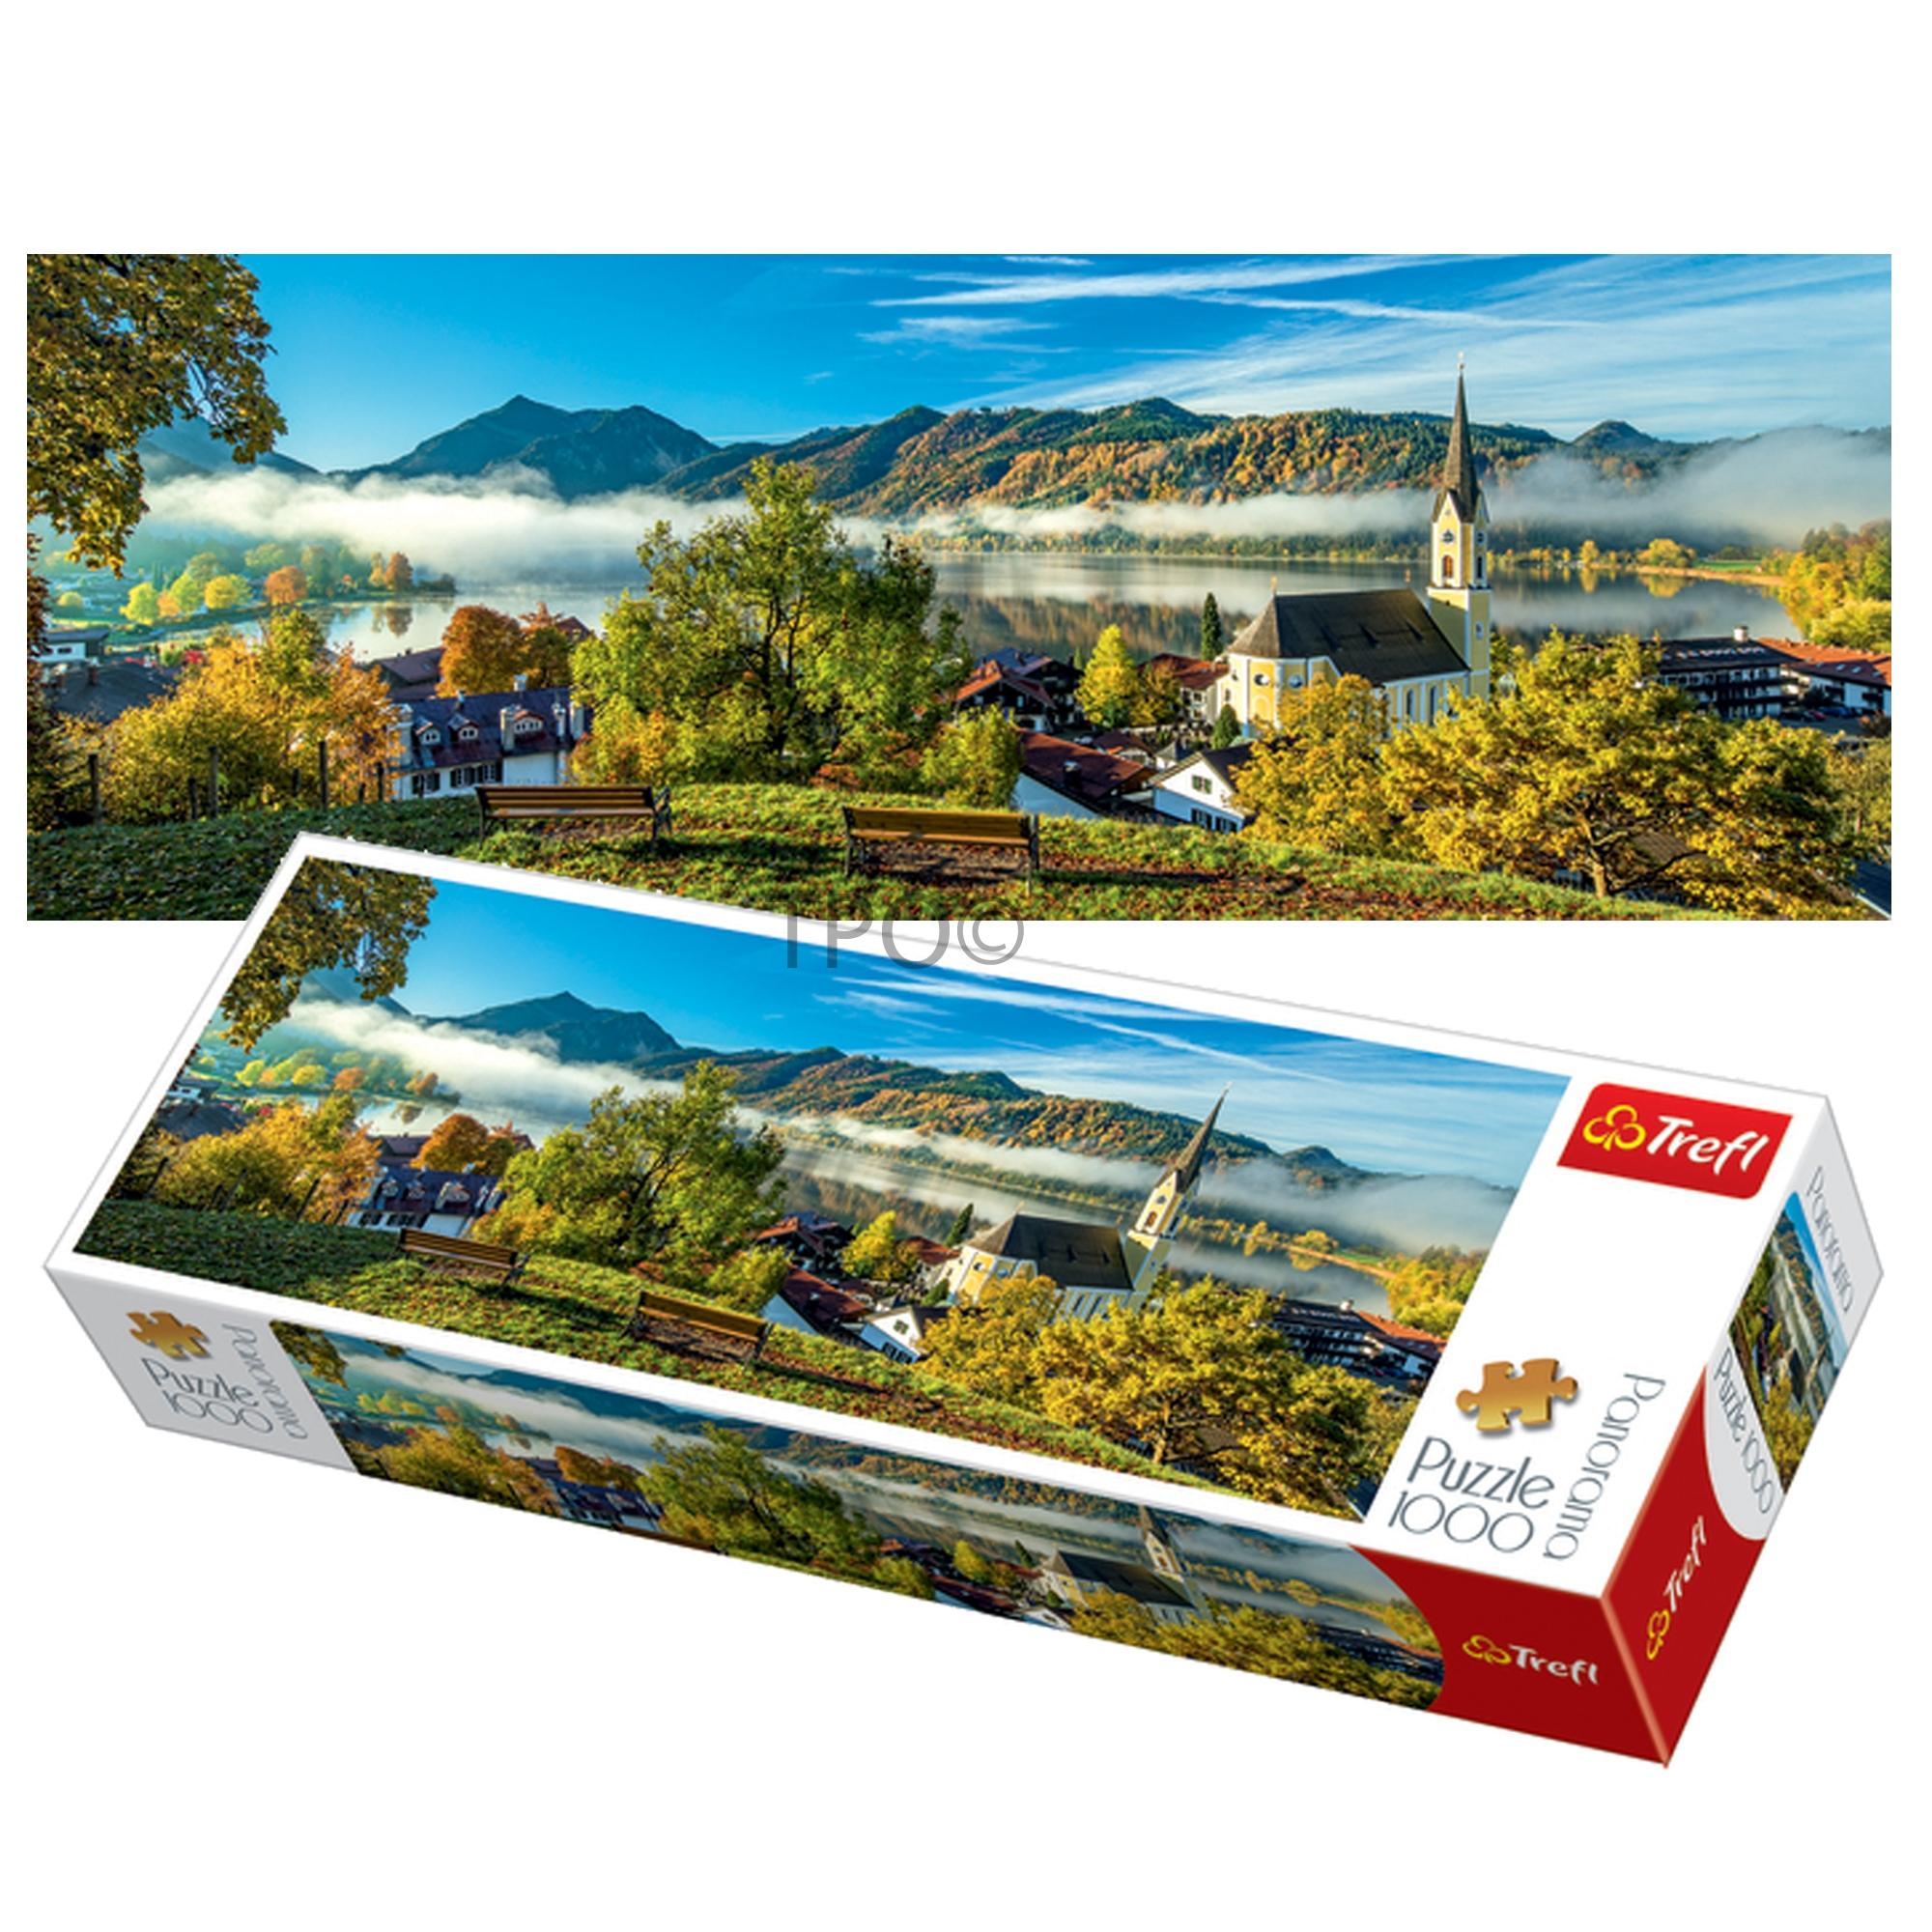 Trefl 1000 Piece Panorama Adult Schliersee Lake Germany